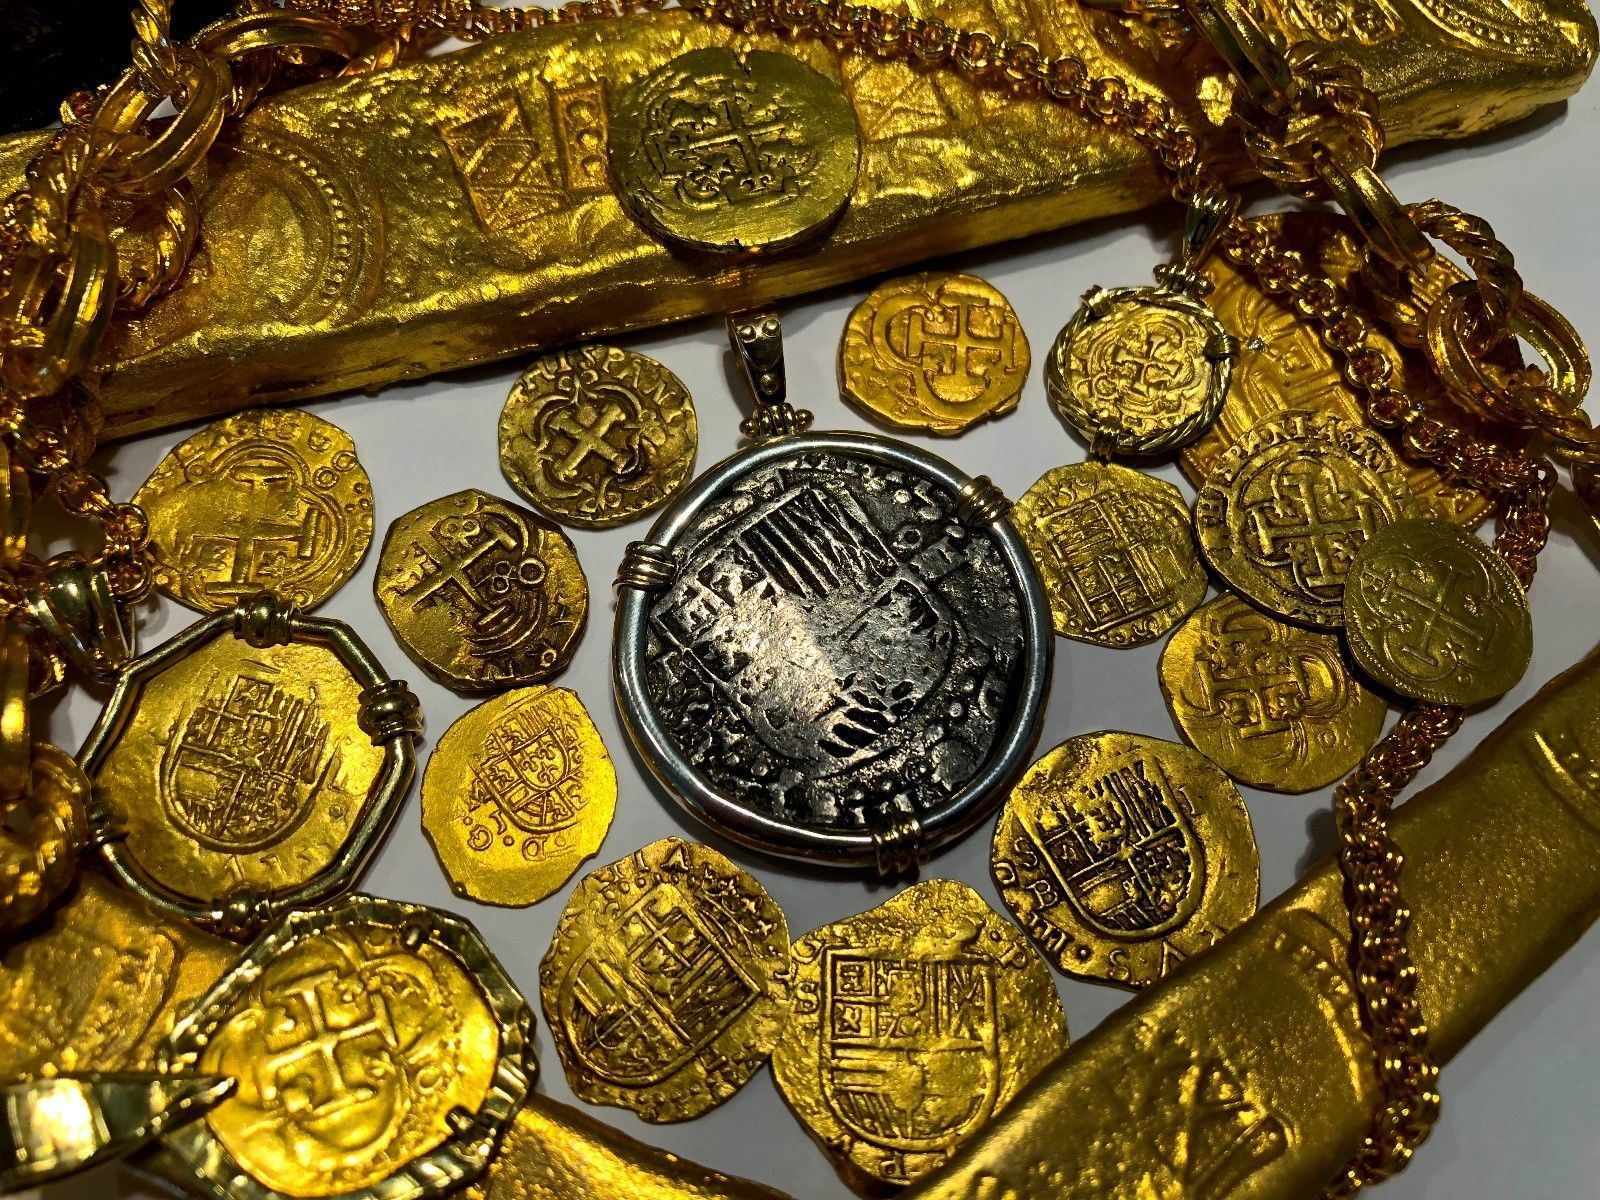 ATOCHA PENDANT 1619 BOLIVIA MEL FISHER COA PIRATE GOLD TREASRUE COIN JEWELERY